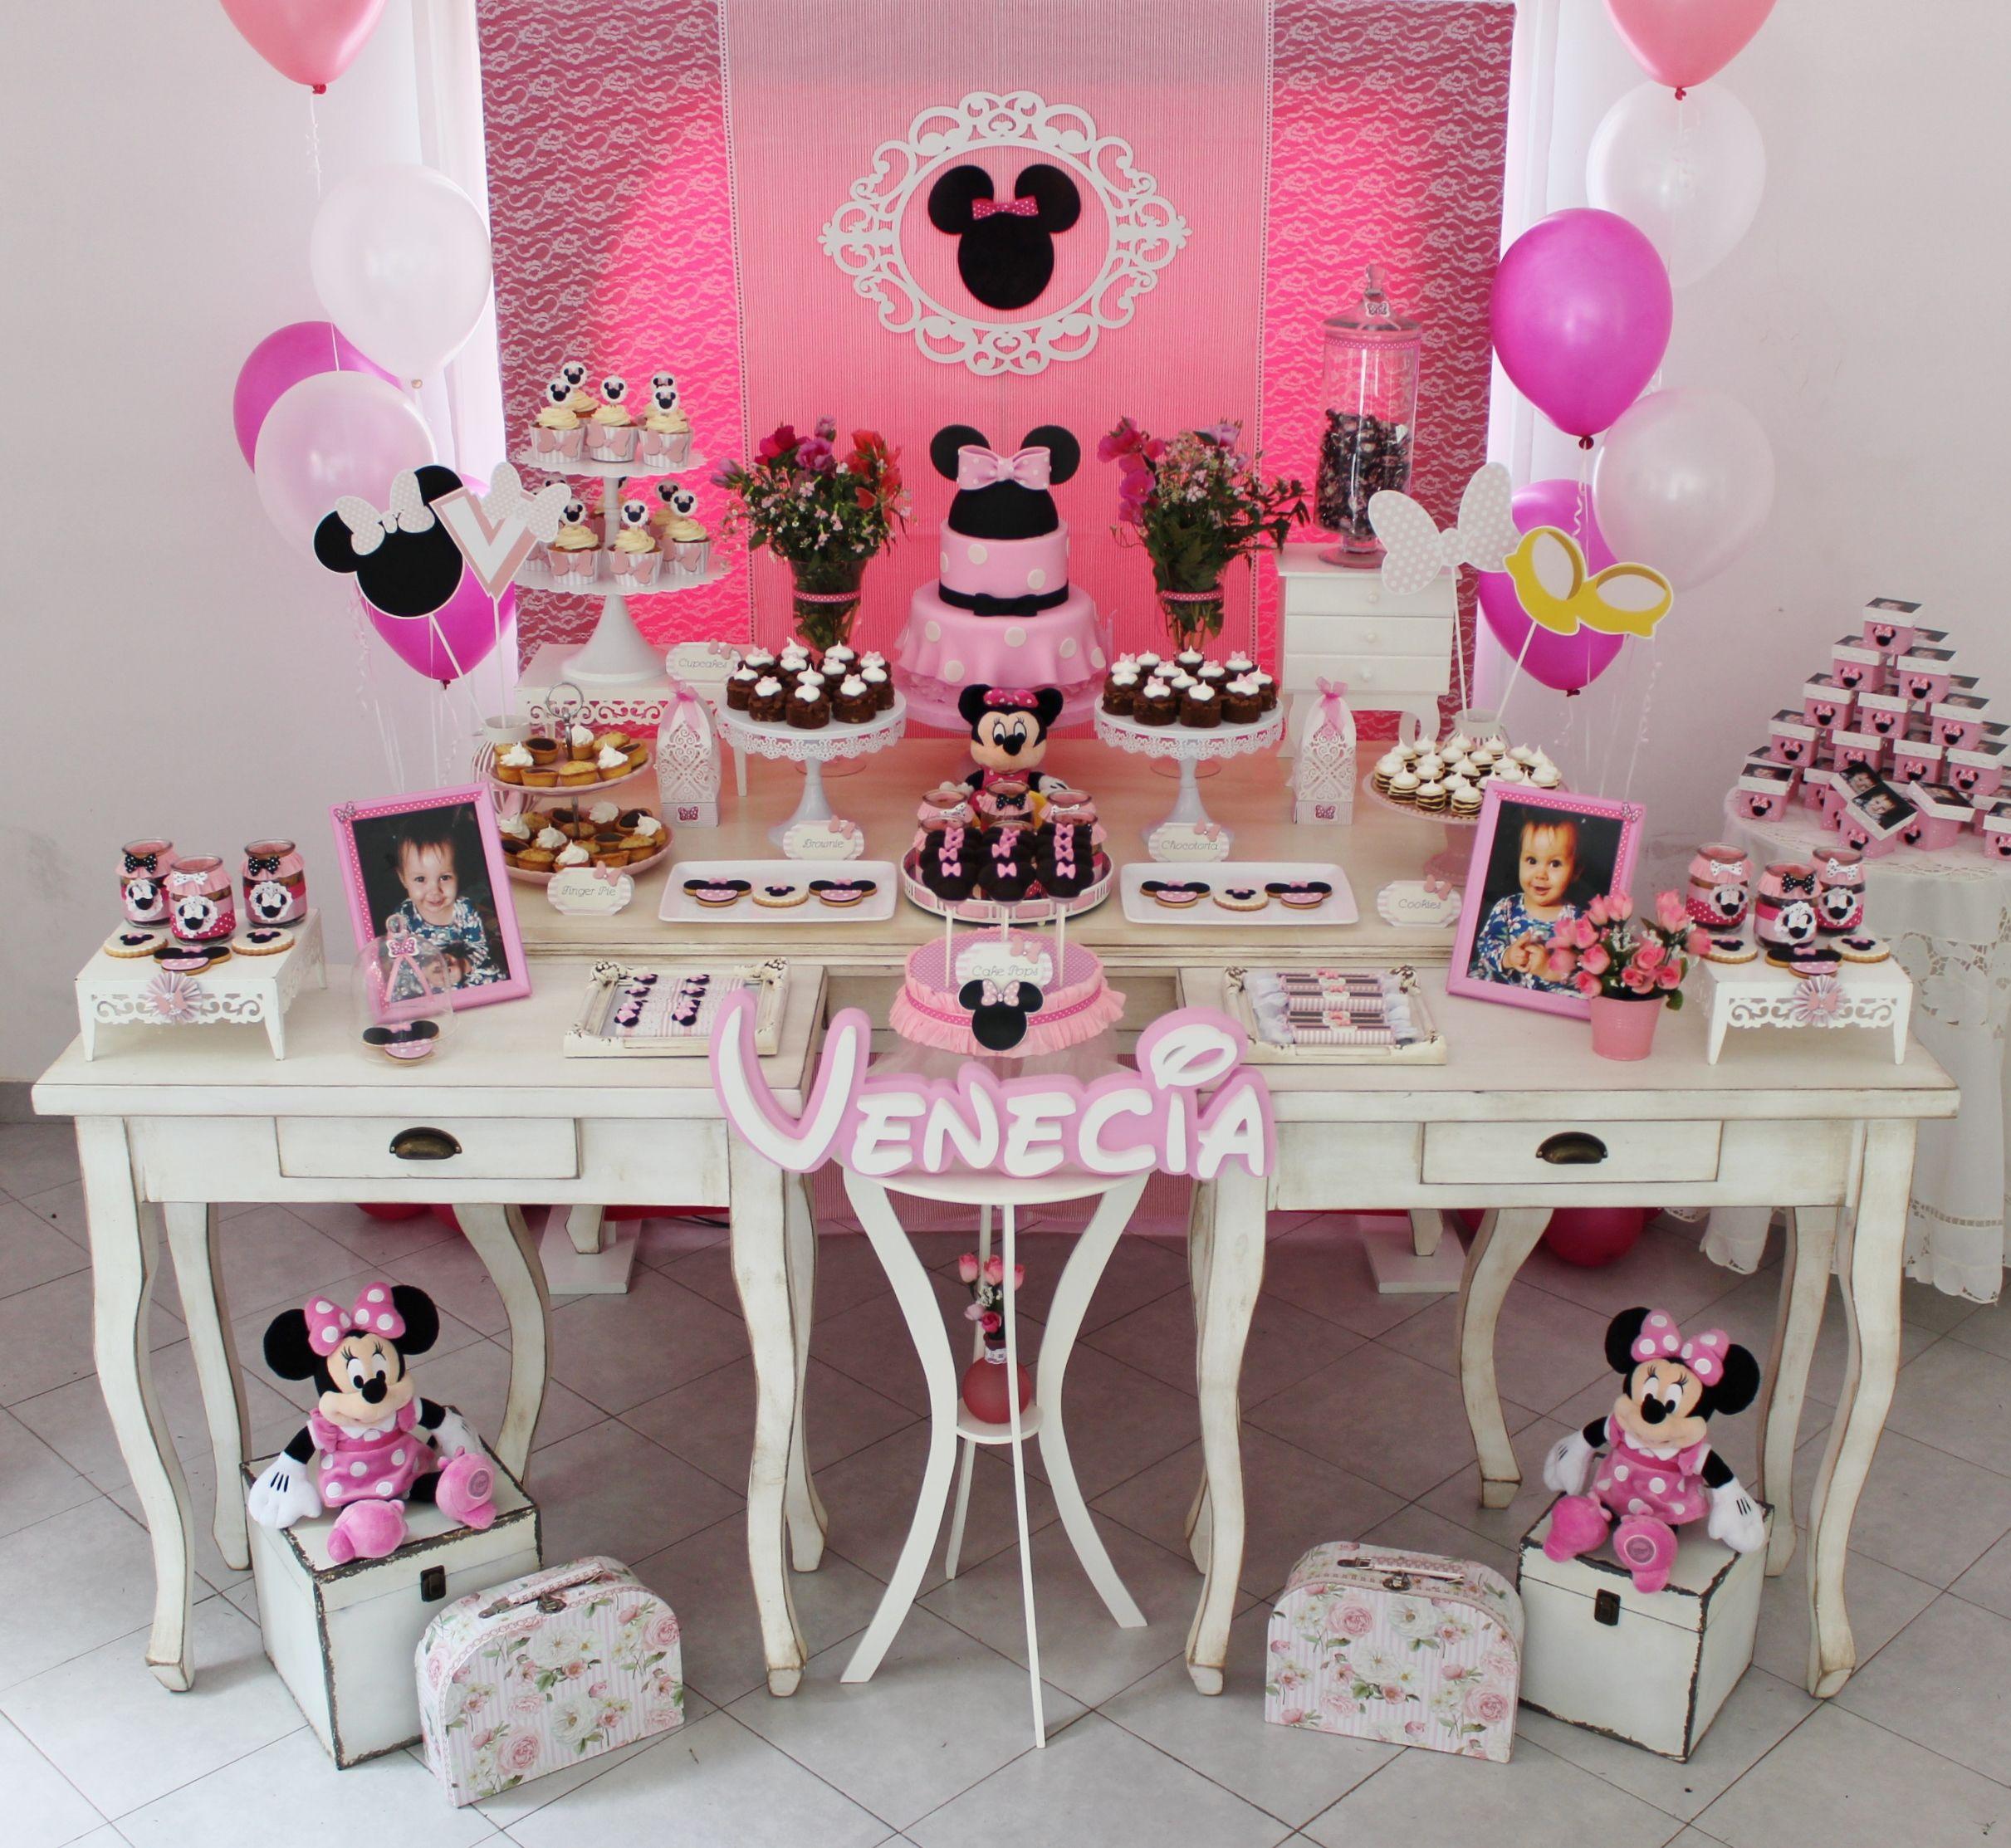 Mesa Tematica Minnie Mouse Rosa Violeta Glace Decoracion Cumpleaños Minnie Decoracion De Cumpleaños Fiesta De Minnie Mouse